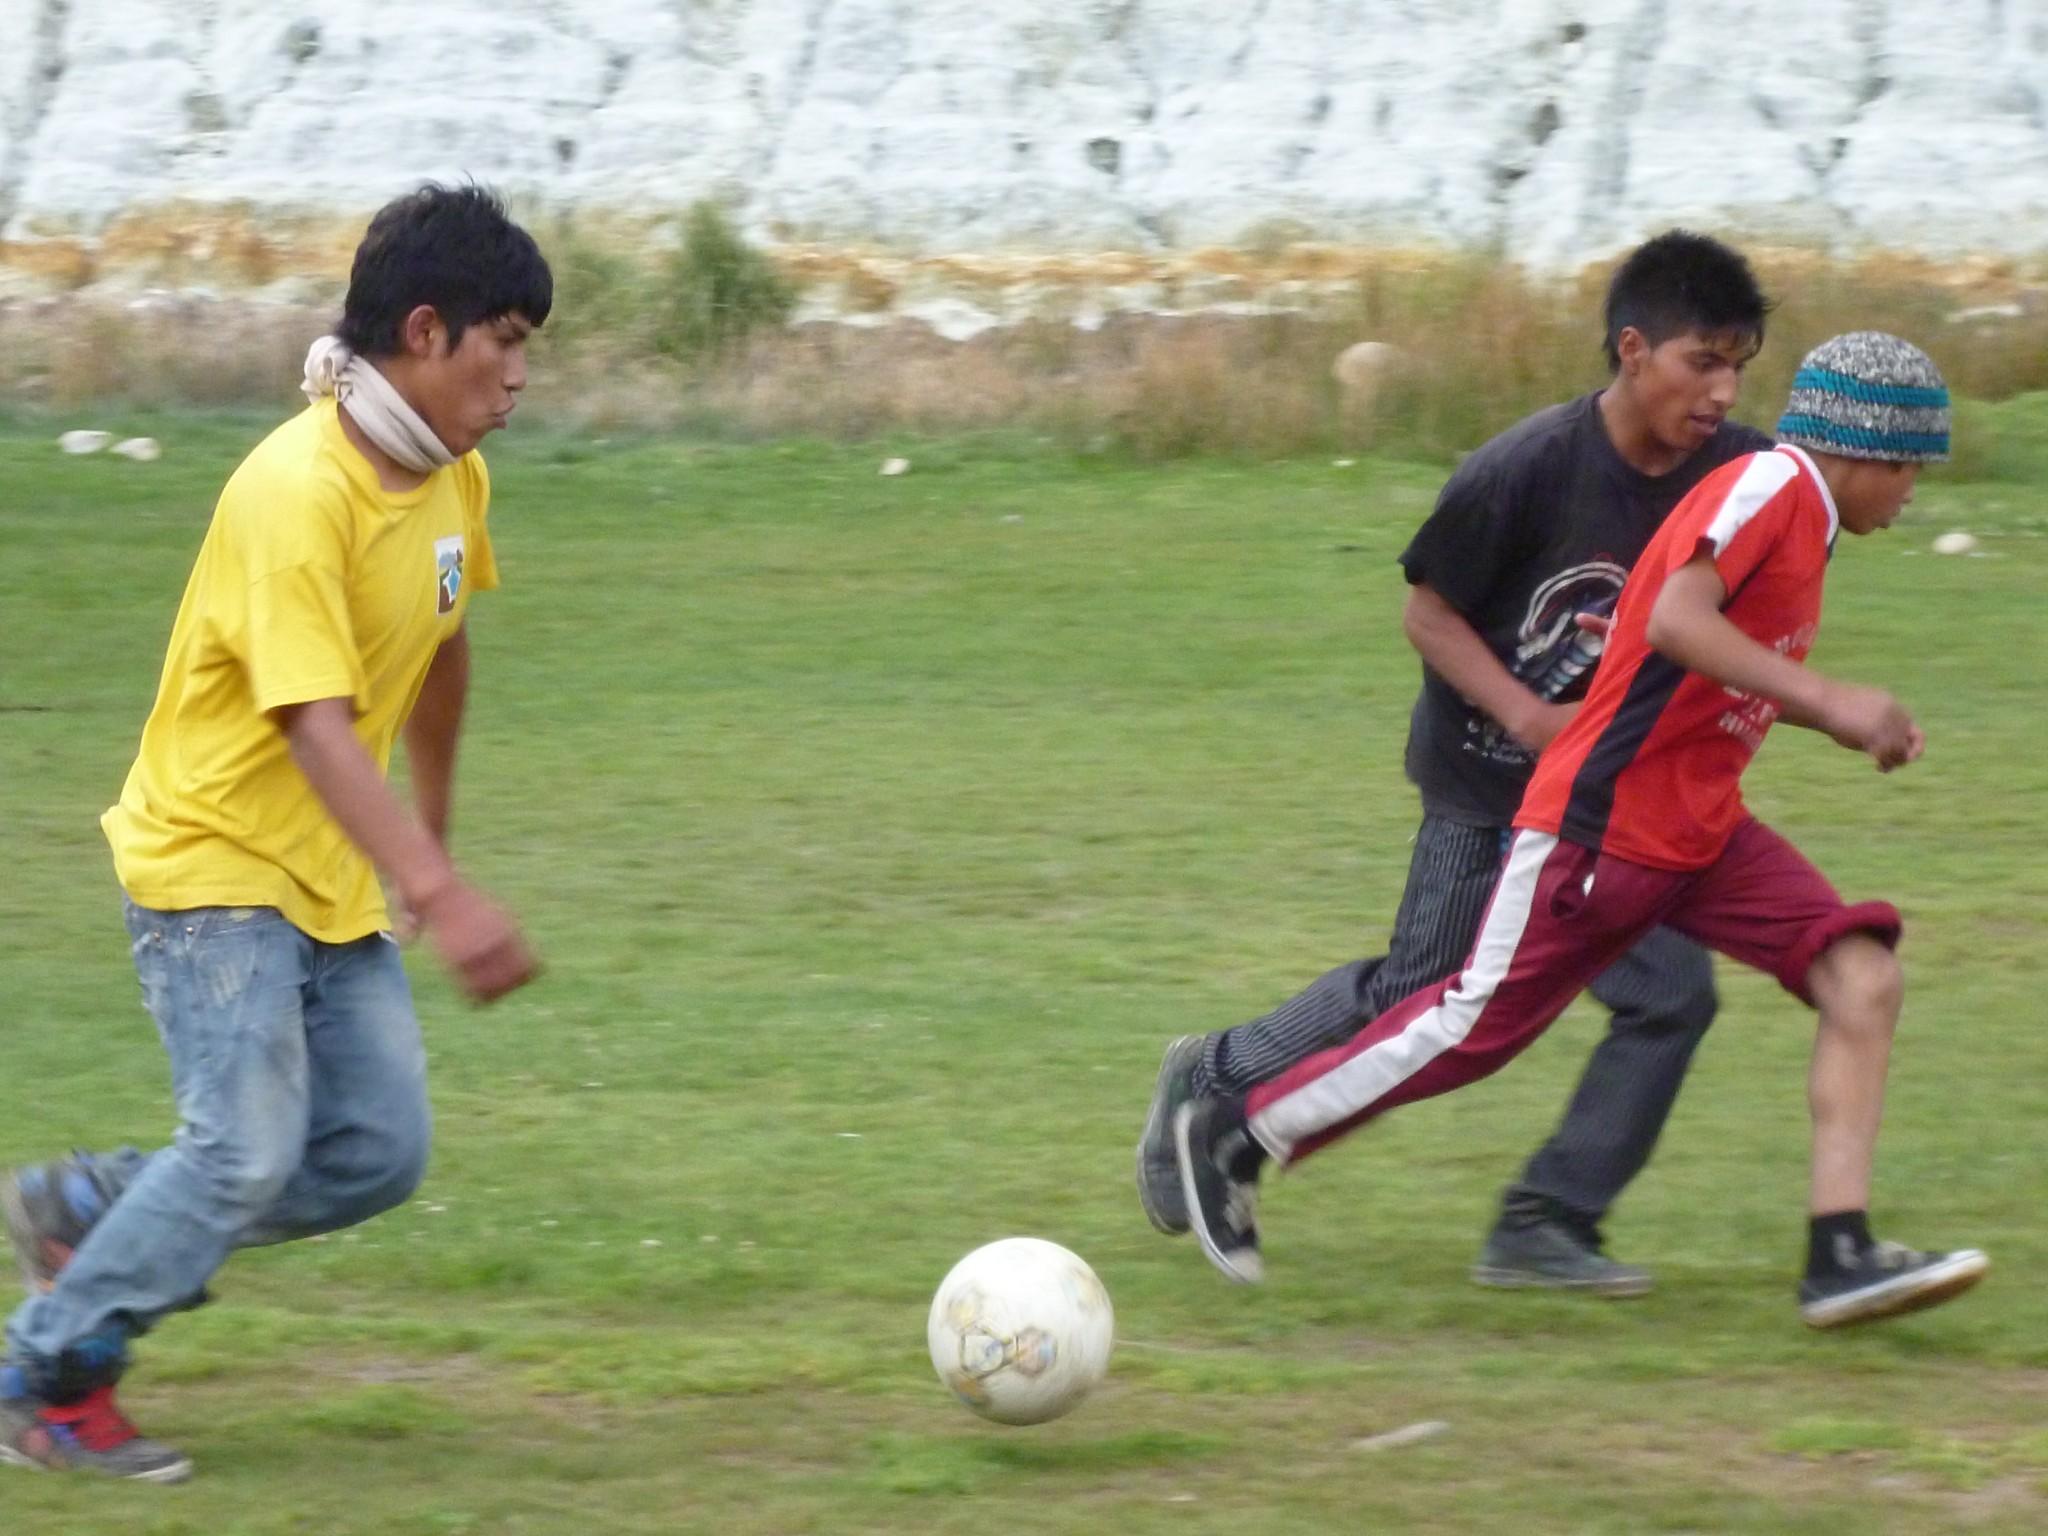 per_hua_manos_paul_saary_fussball